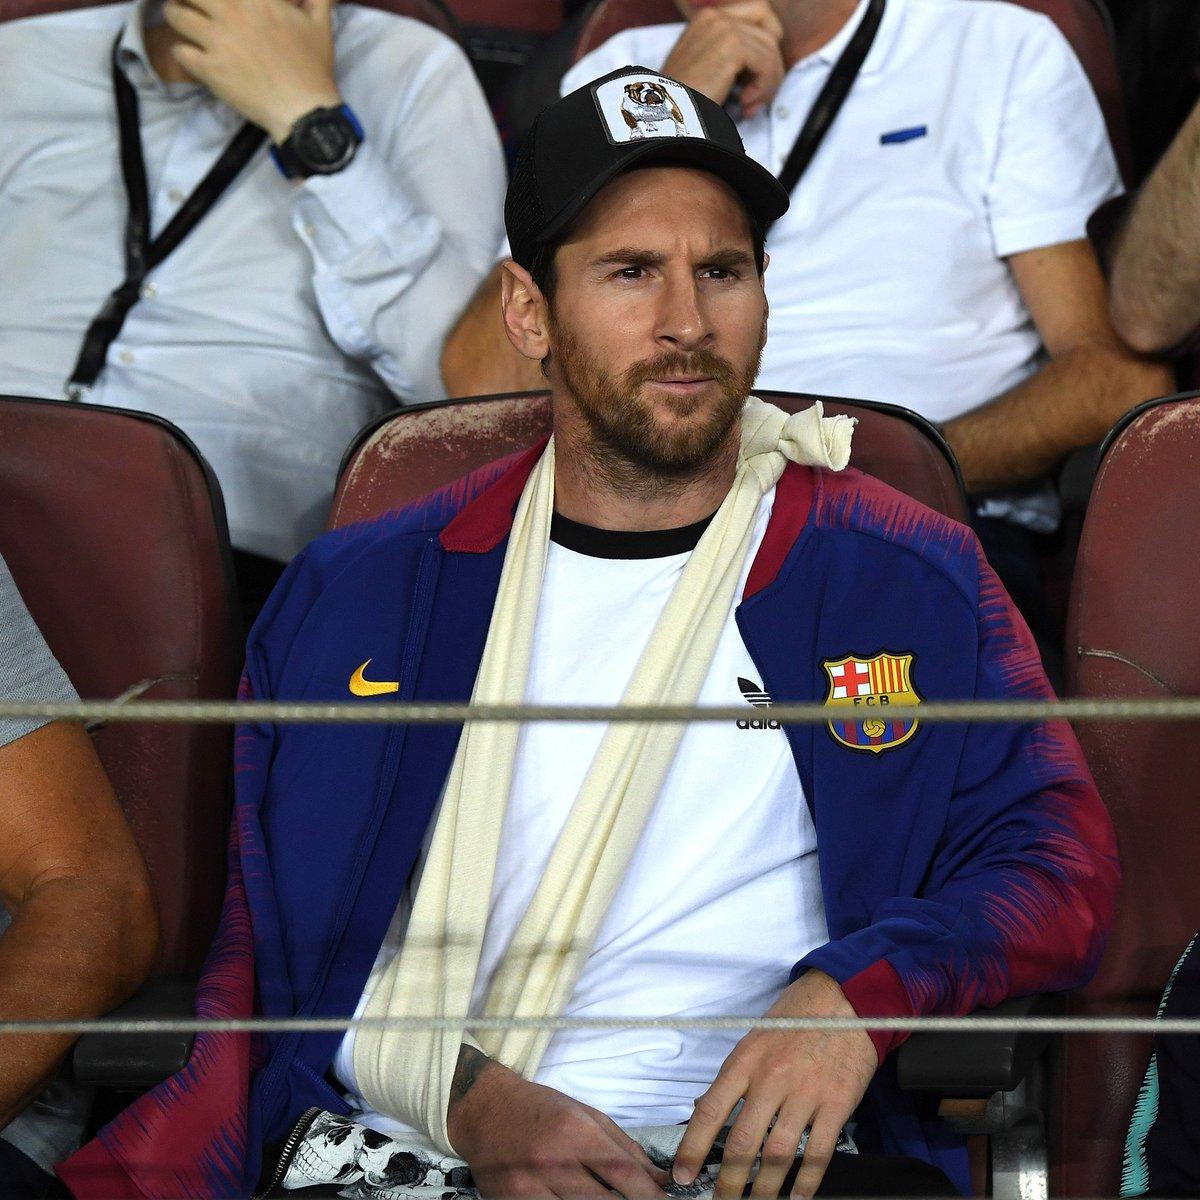 7676471c81ffe Messi rockin  the Butch trucker baseball cap from Goorin Bros. tonight.   FuerzaLeopic.twitter.com kuCM0WDMus